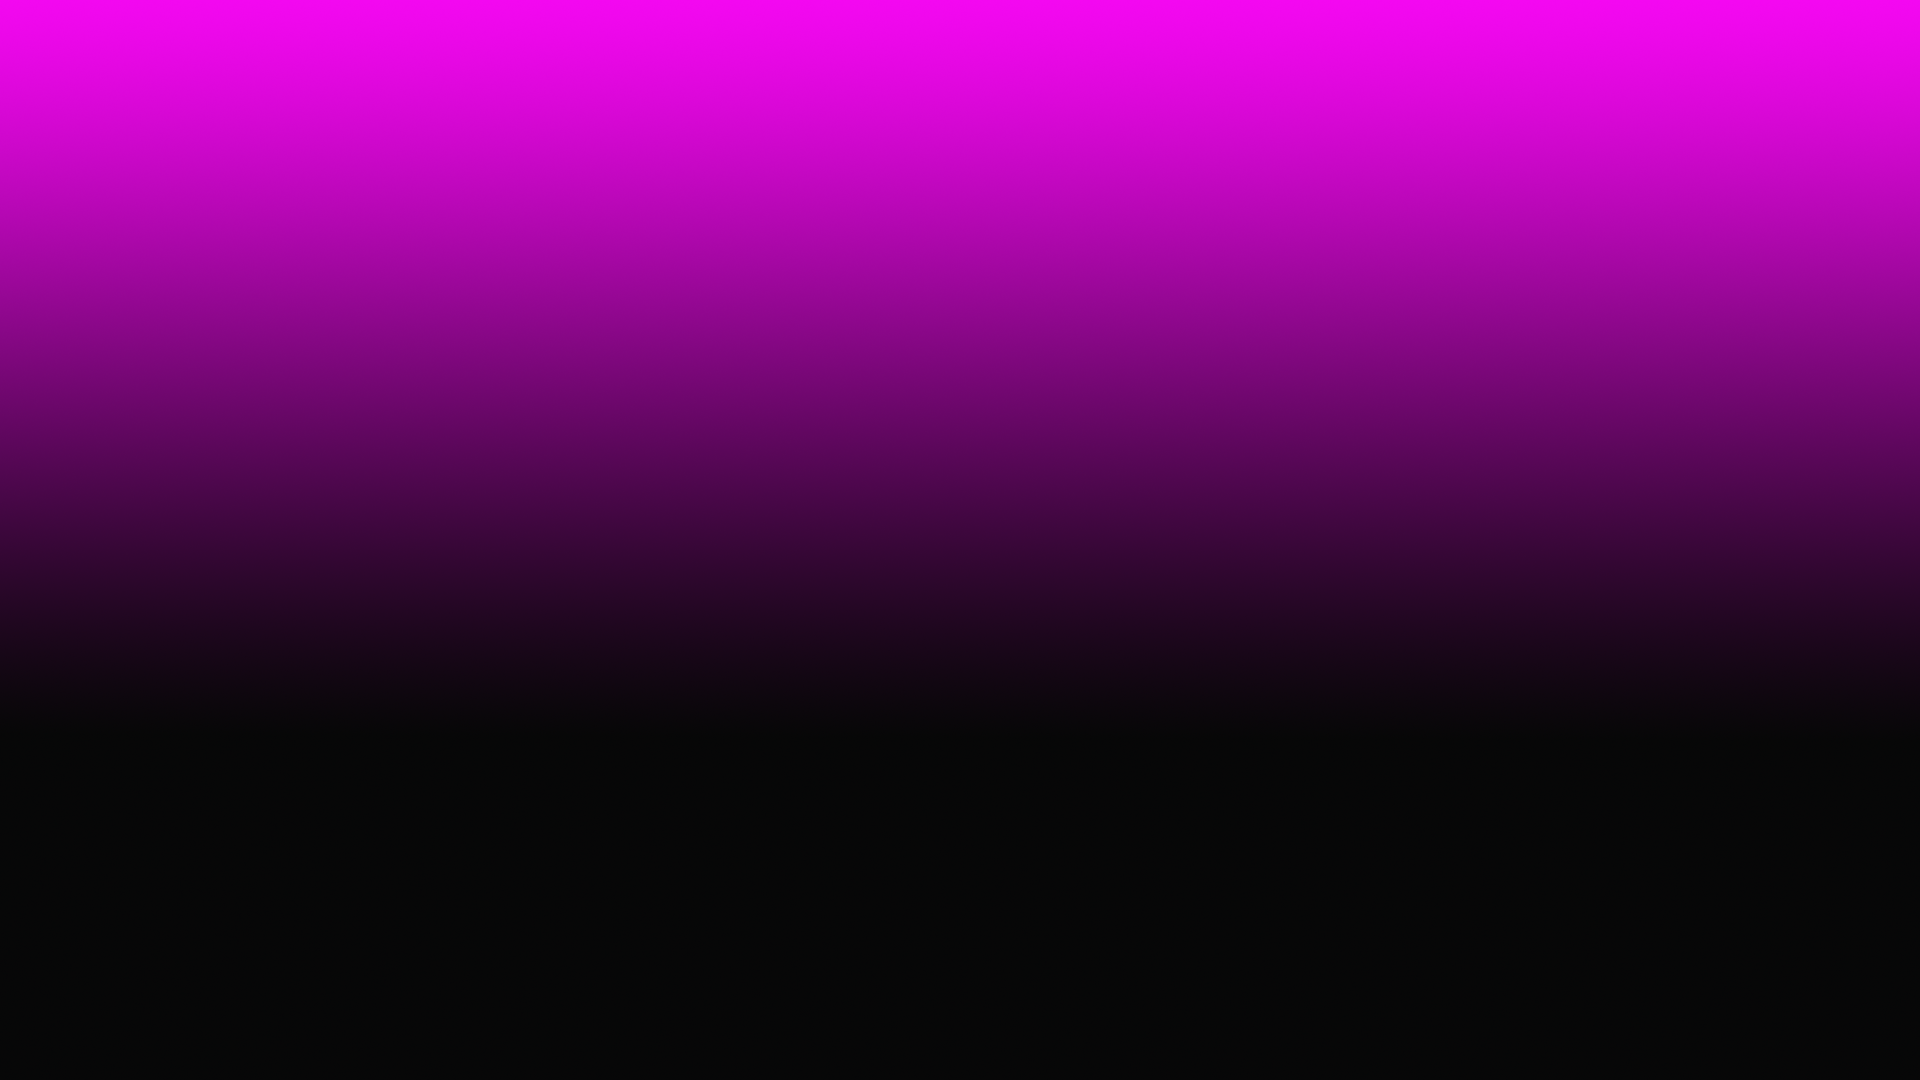 1080 png 1005kB 19201080 Pink and Black Gradient Desktop Wallpaper 1920x1080